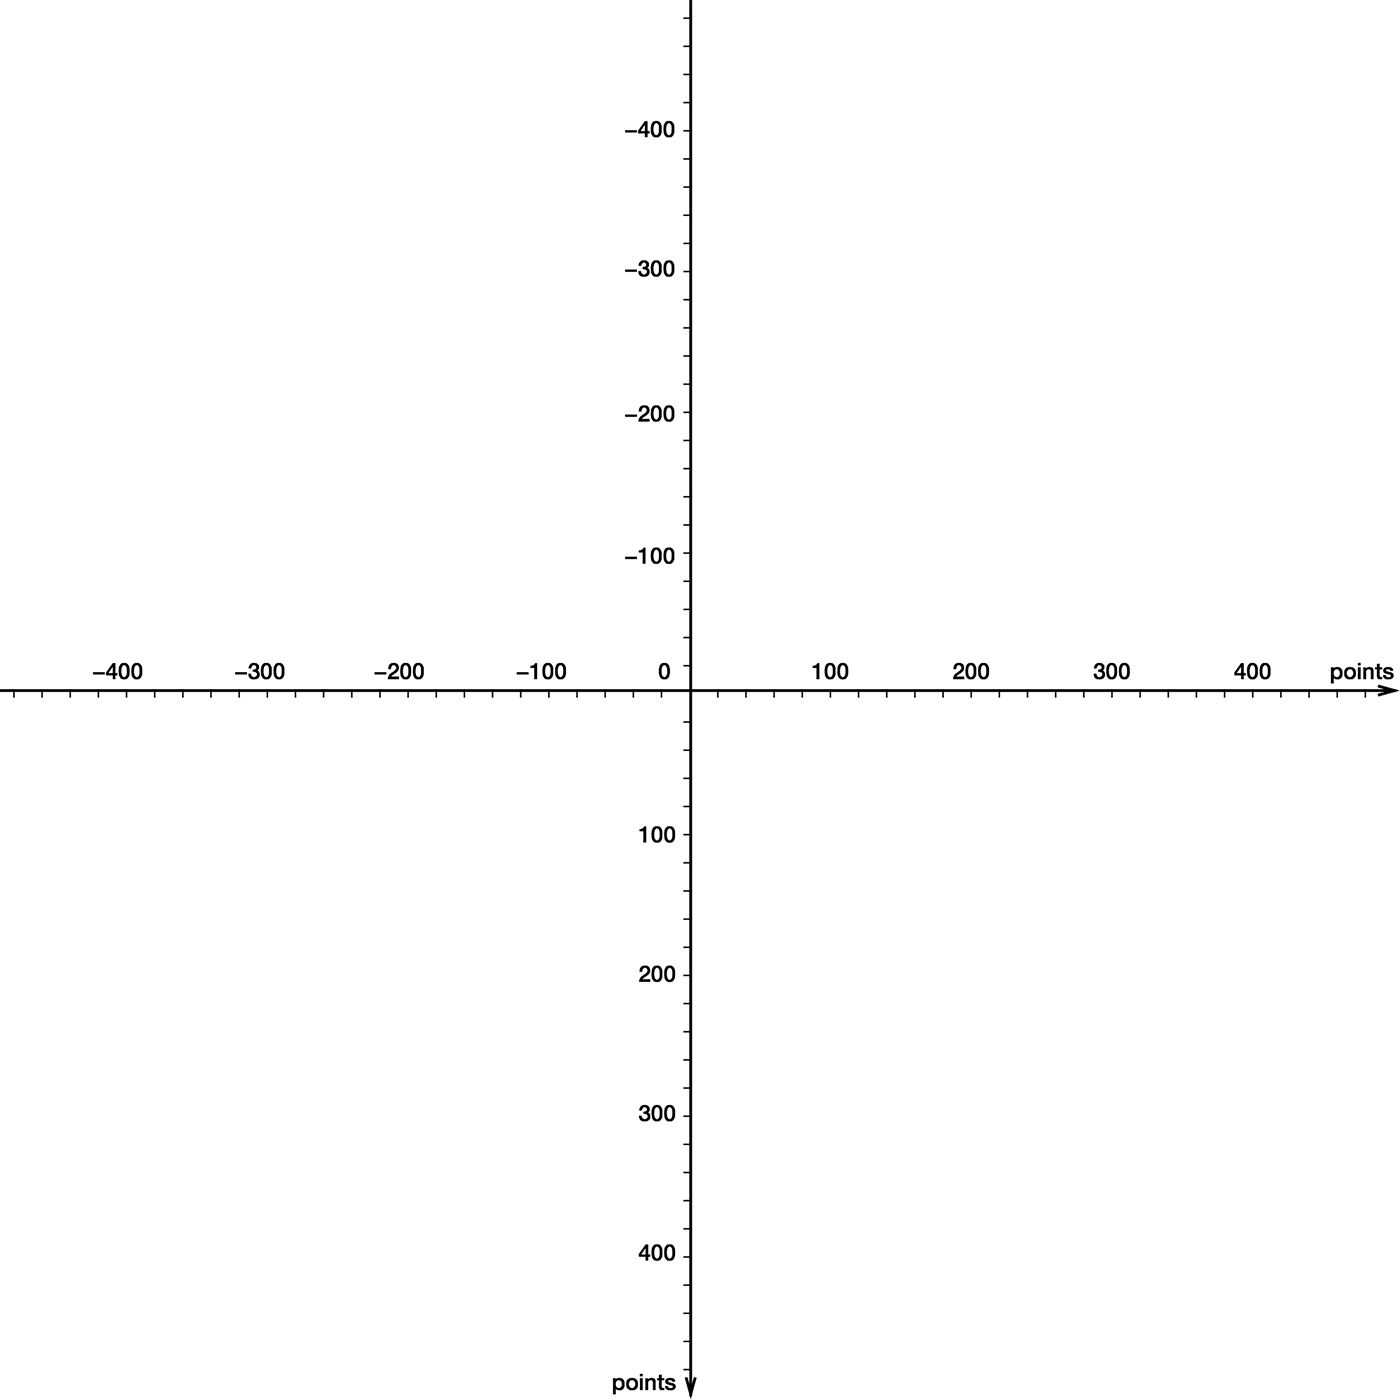 Understanding Uiscrollview Ole Begemann